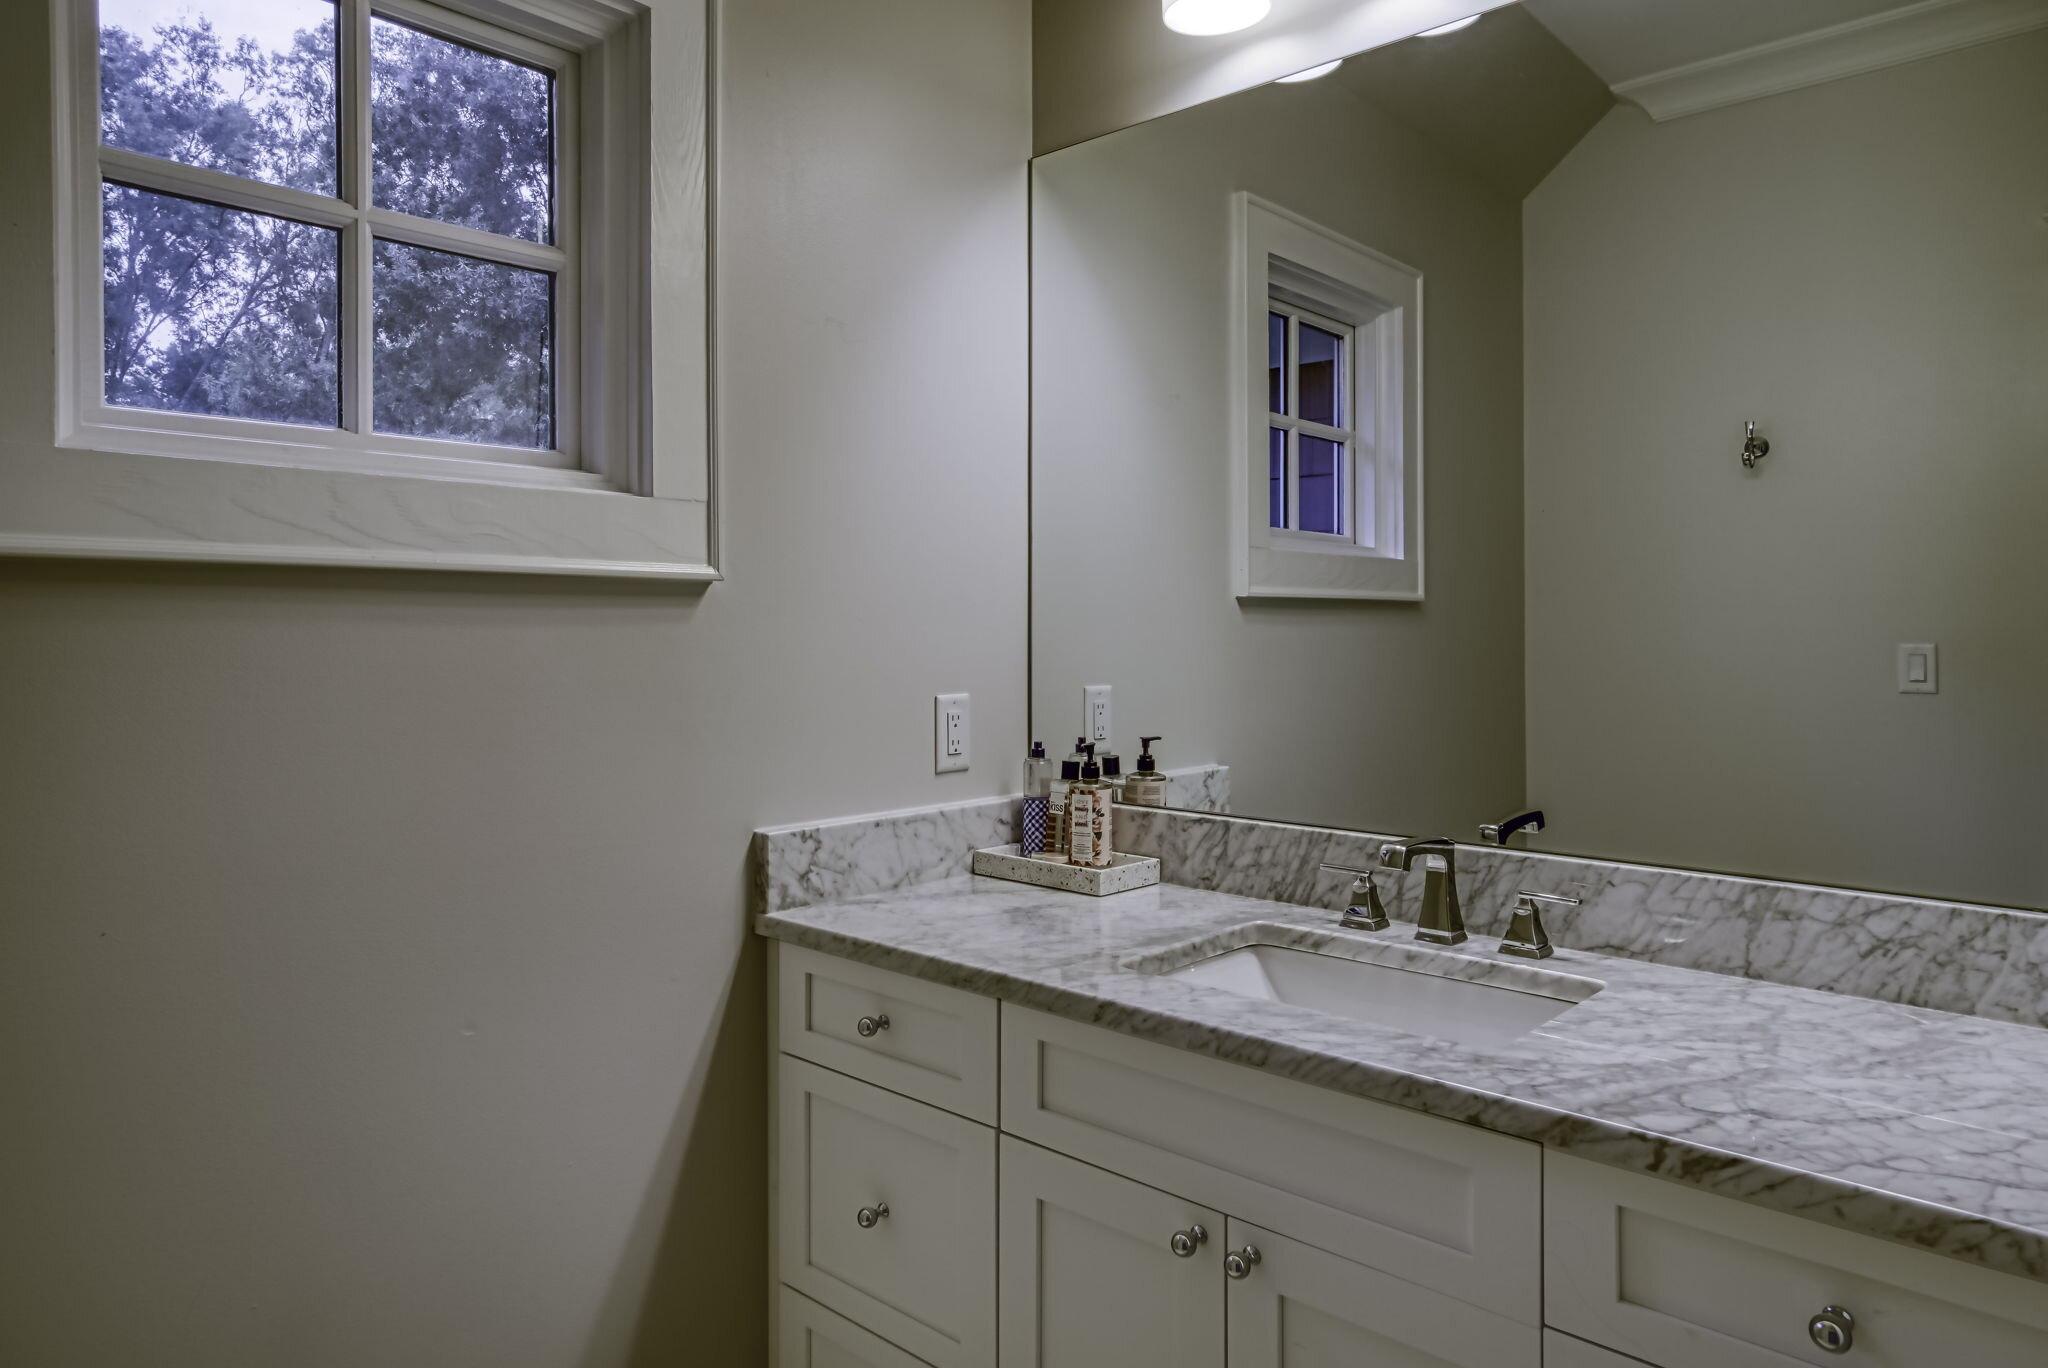 35-web-or-mls-4900 Carmel Park Dr Bedroom 3 Bath.jpg